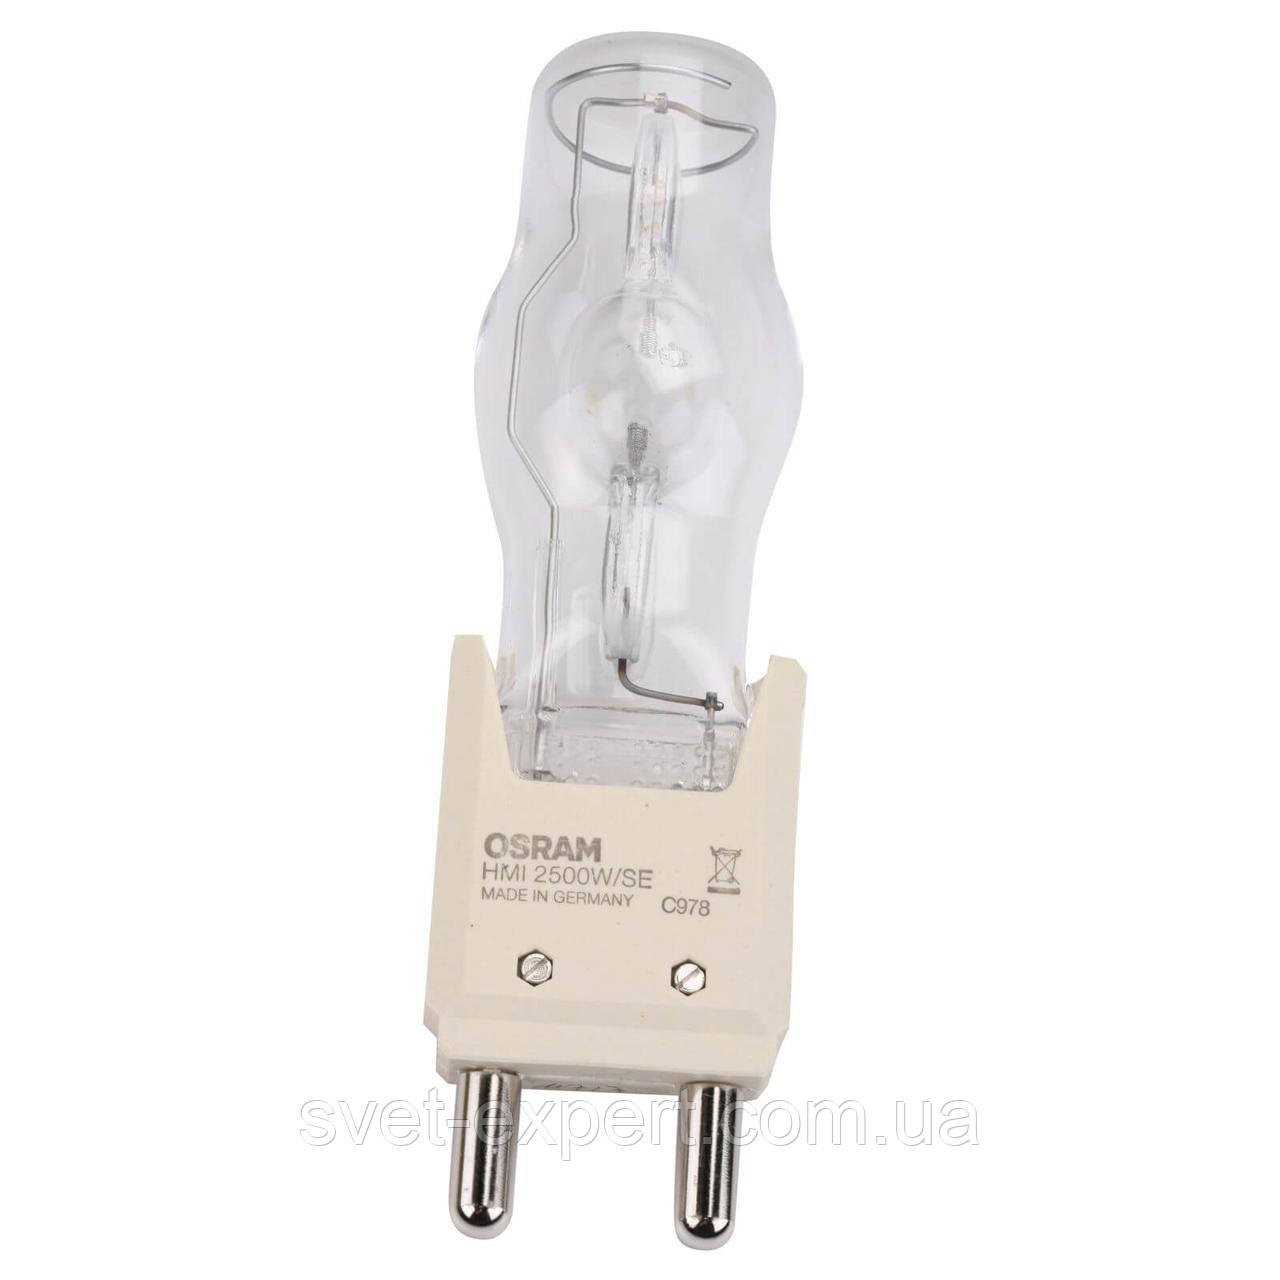 Лампа HMI 2500W/SE XS 2500Вт 6000K° 500ч 115В G38 1x1 OSRAM